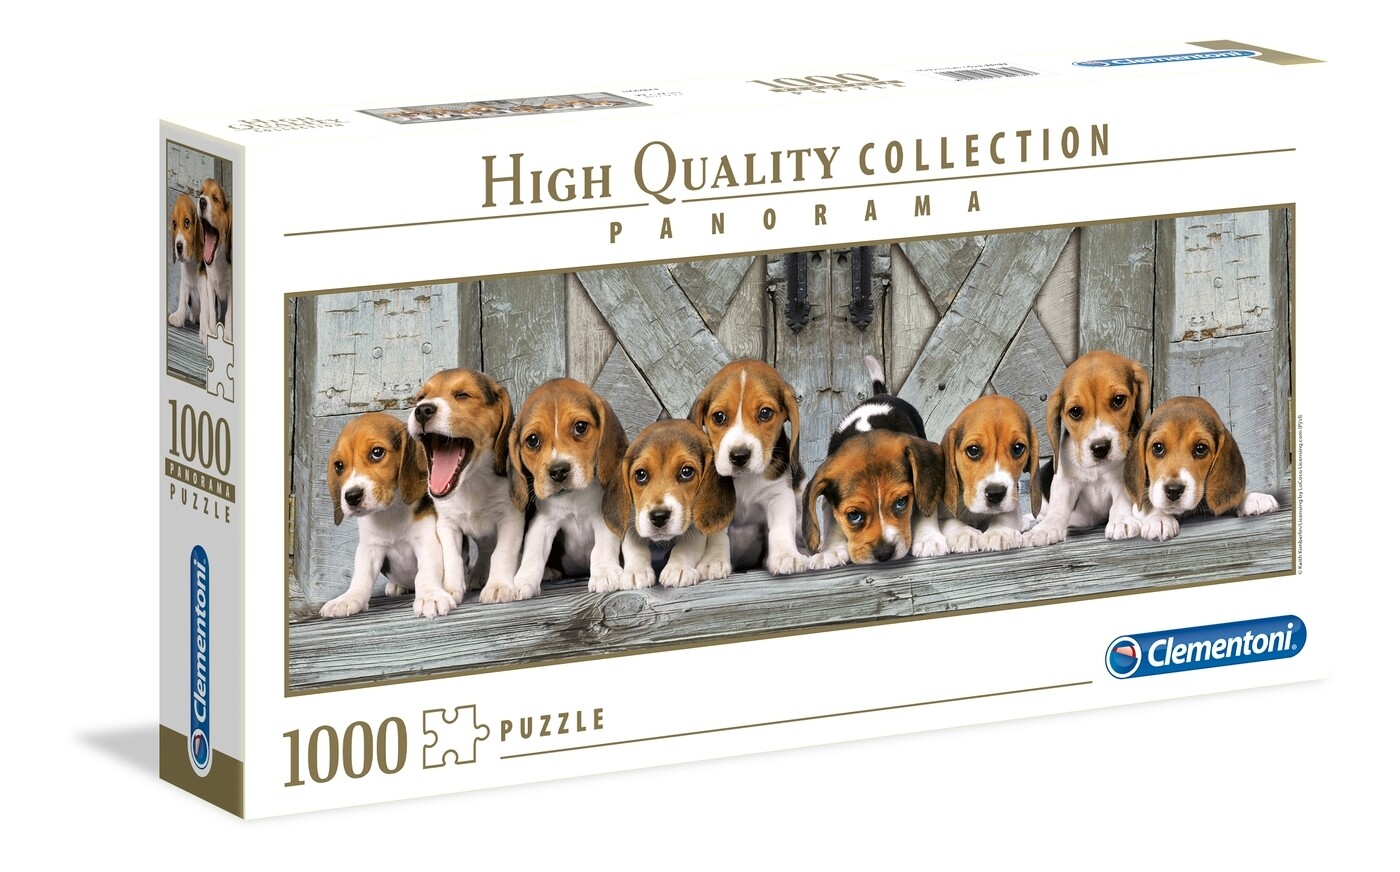 PUZZLE 1000 HQ Panorama - Beagles - CLEMENTONI